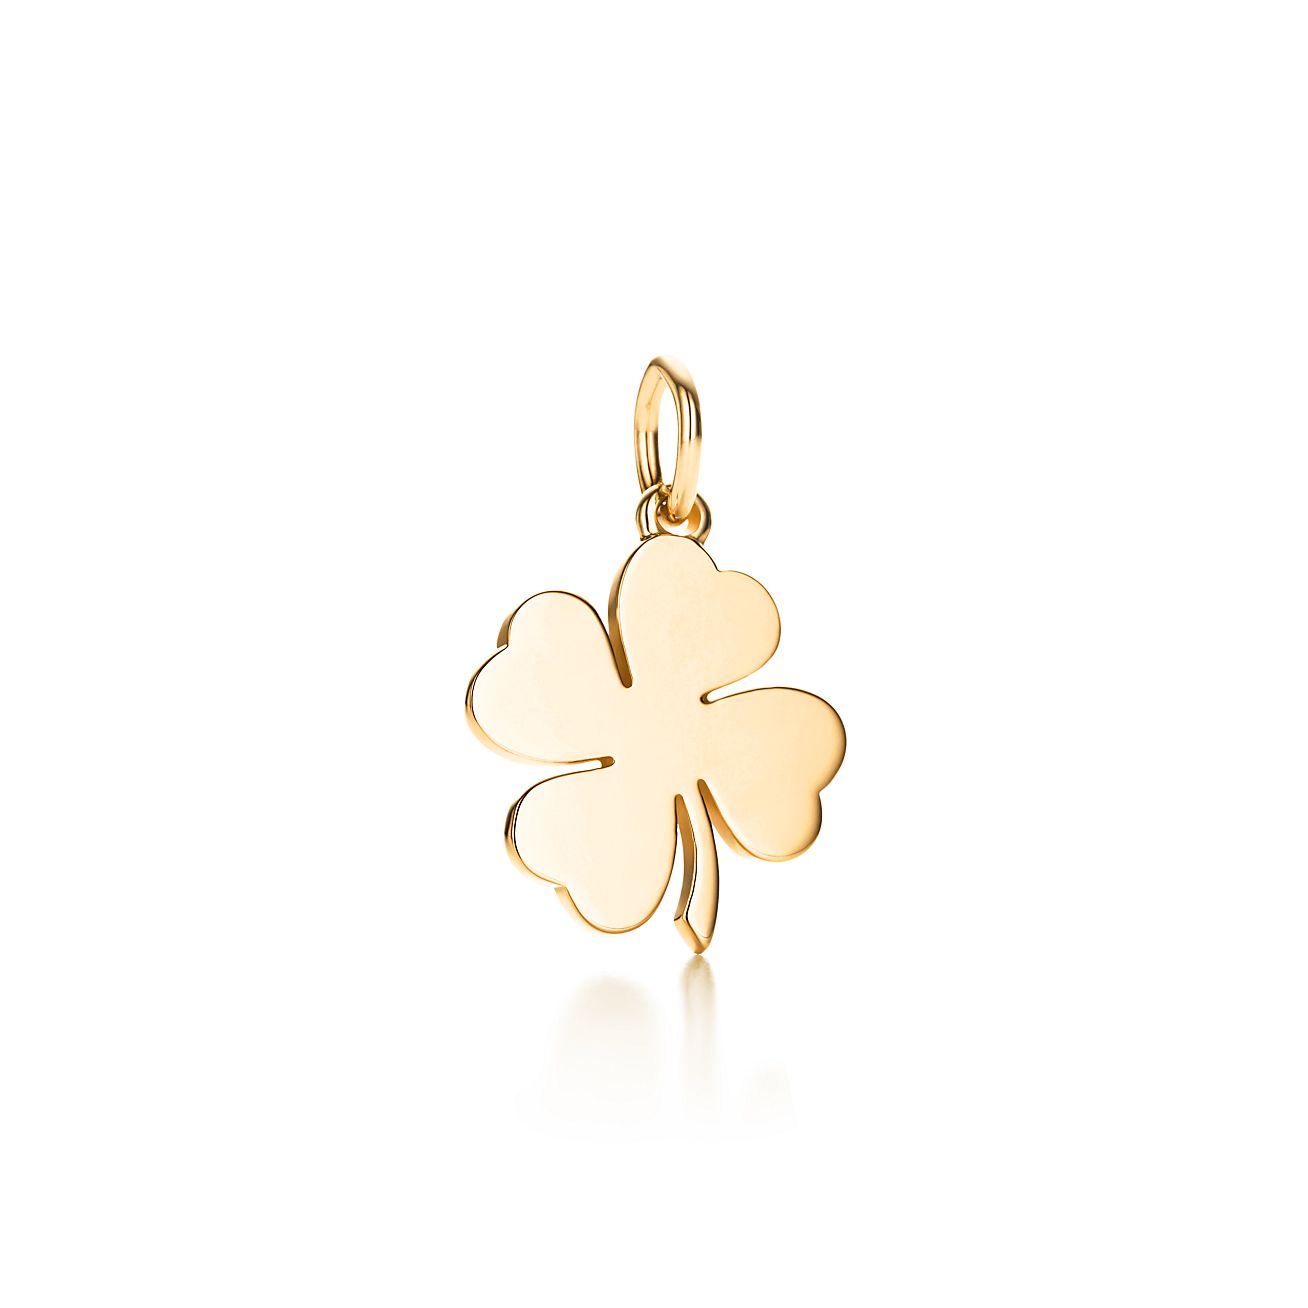 Four Leaf Clover charm in 18k gold Tiffany Co